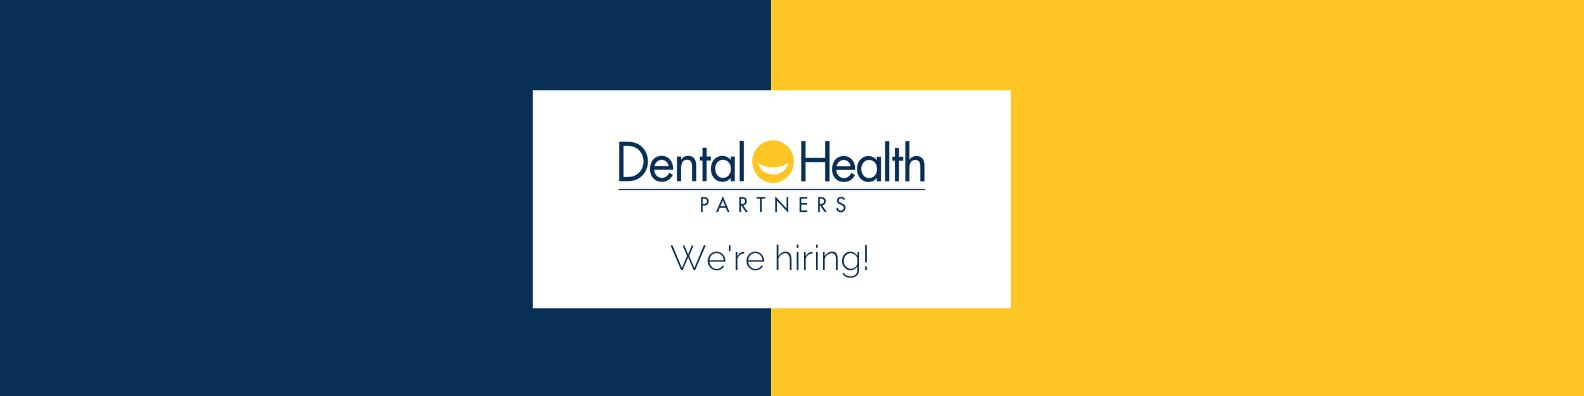 Dental Hygienist Job Opening | Dental Health Partners | Cedar Rapids, Iowa